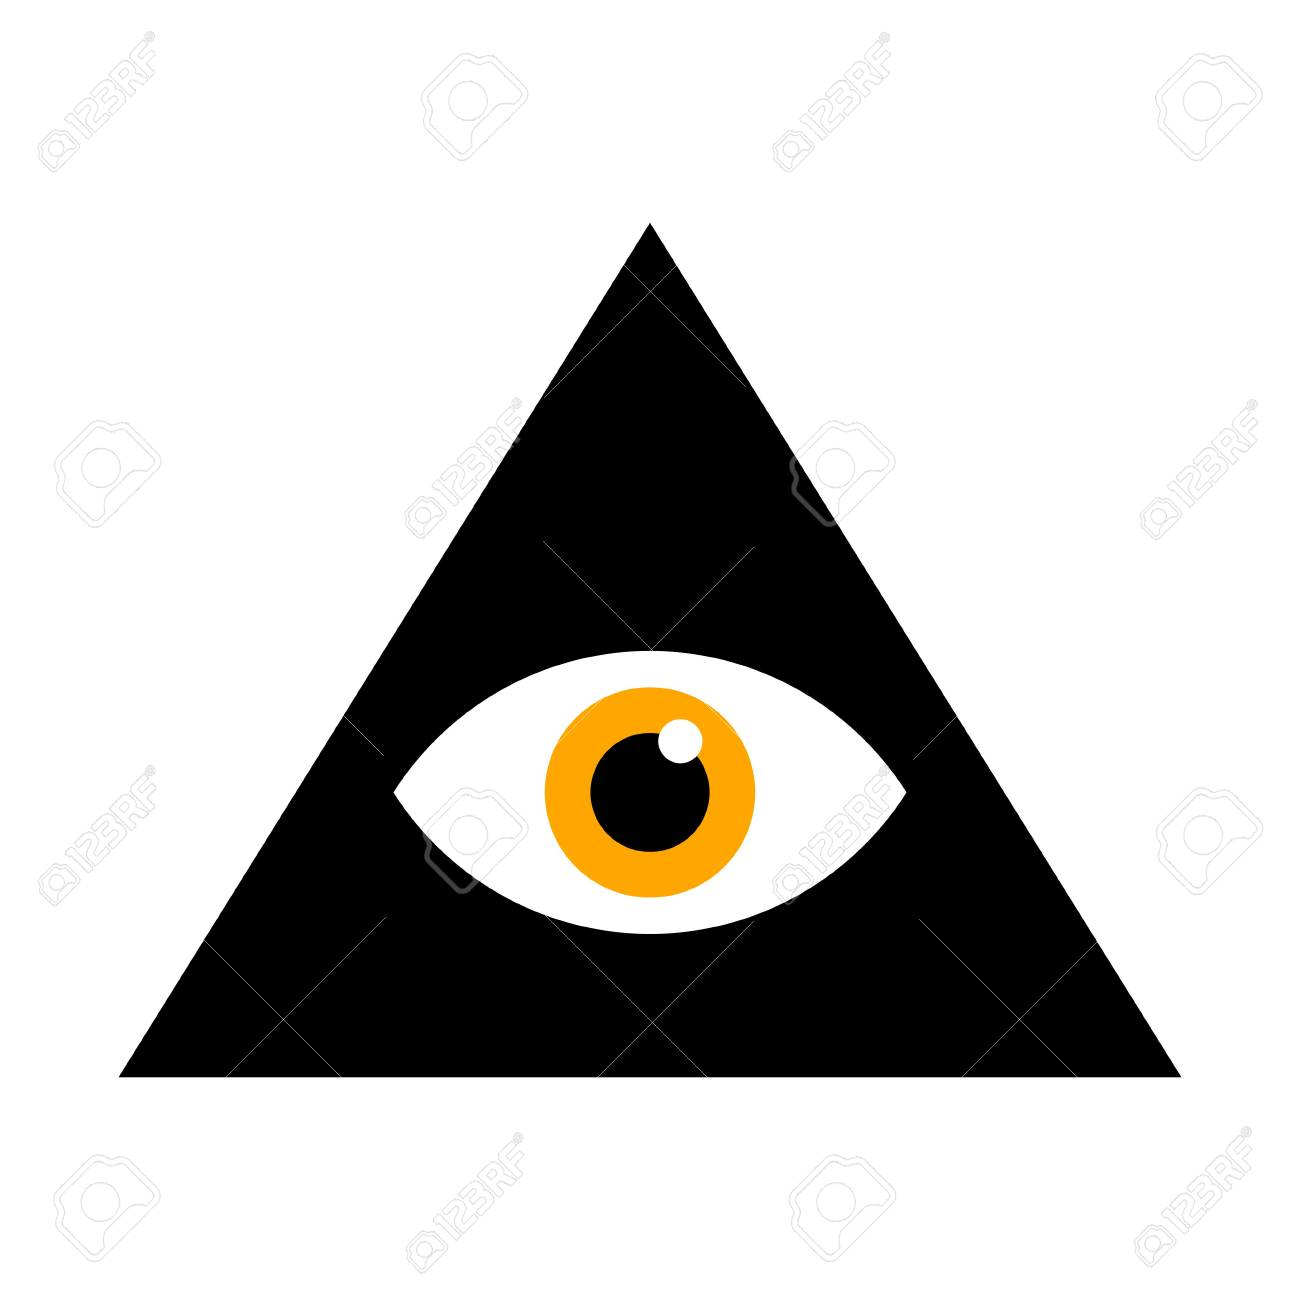 Seeing Eye All Seeing Eye Inside Triangle Pyramid Vector